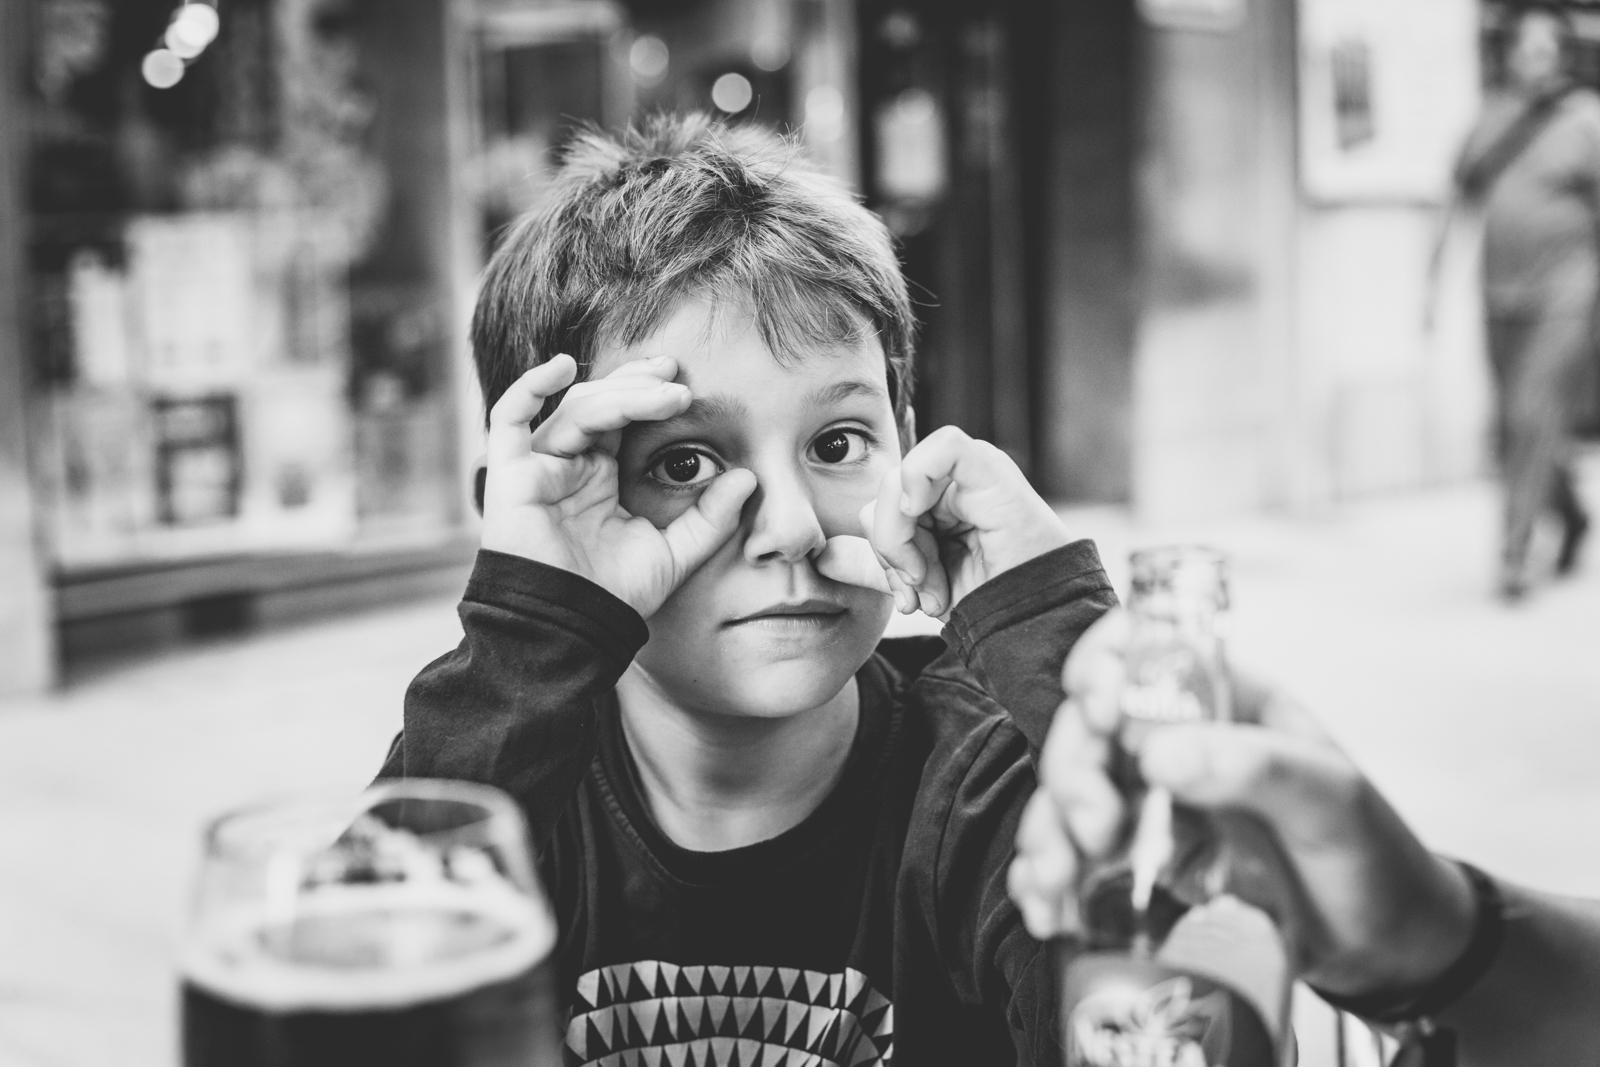 fotografo-familia-barcelona-misshappyflash-27.jpg